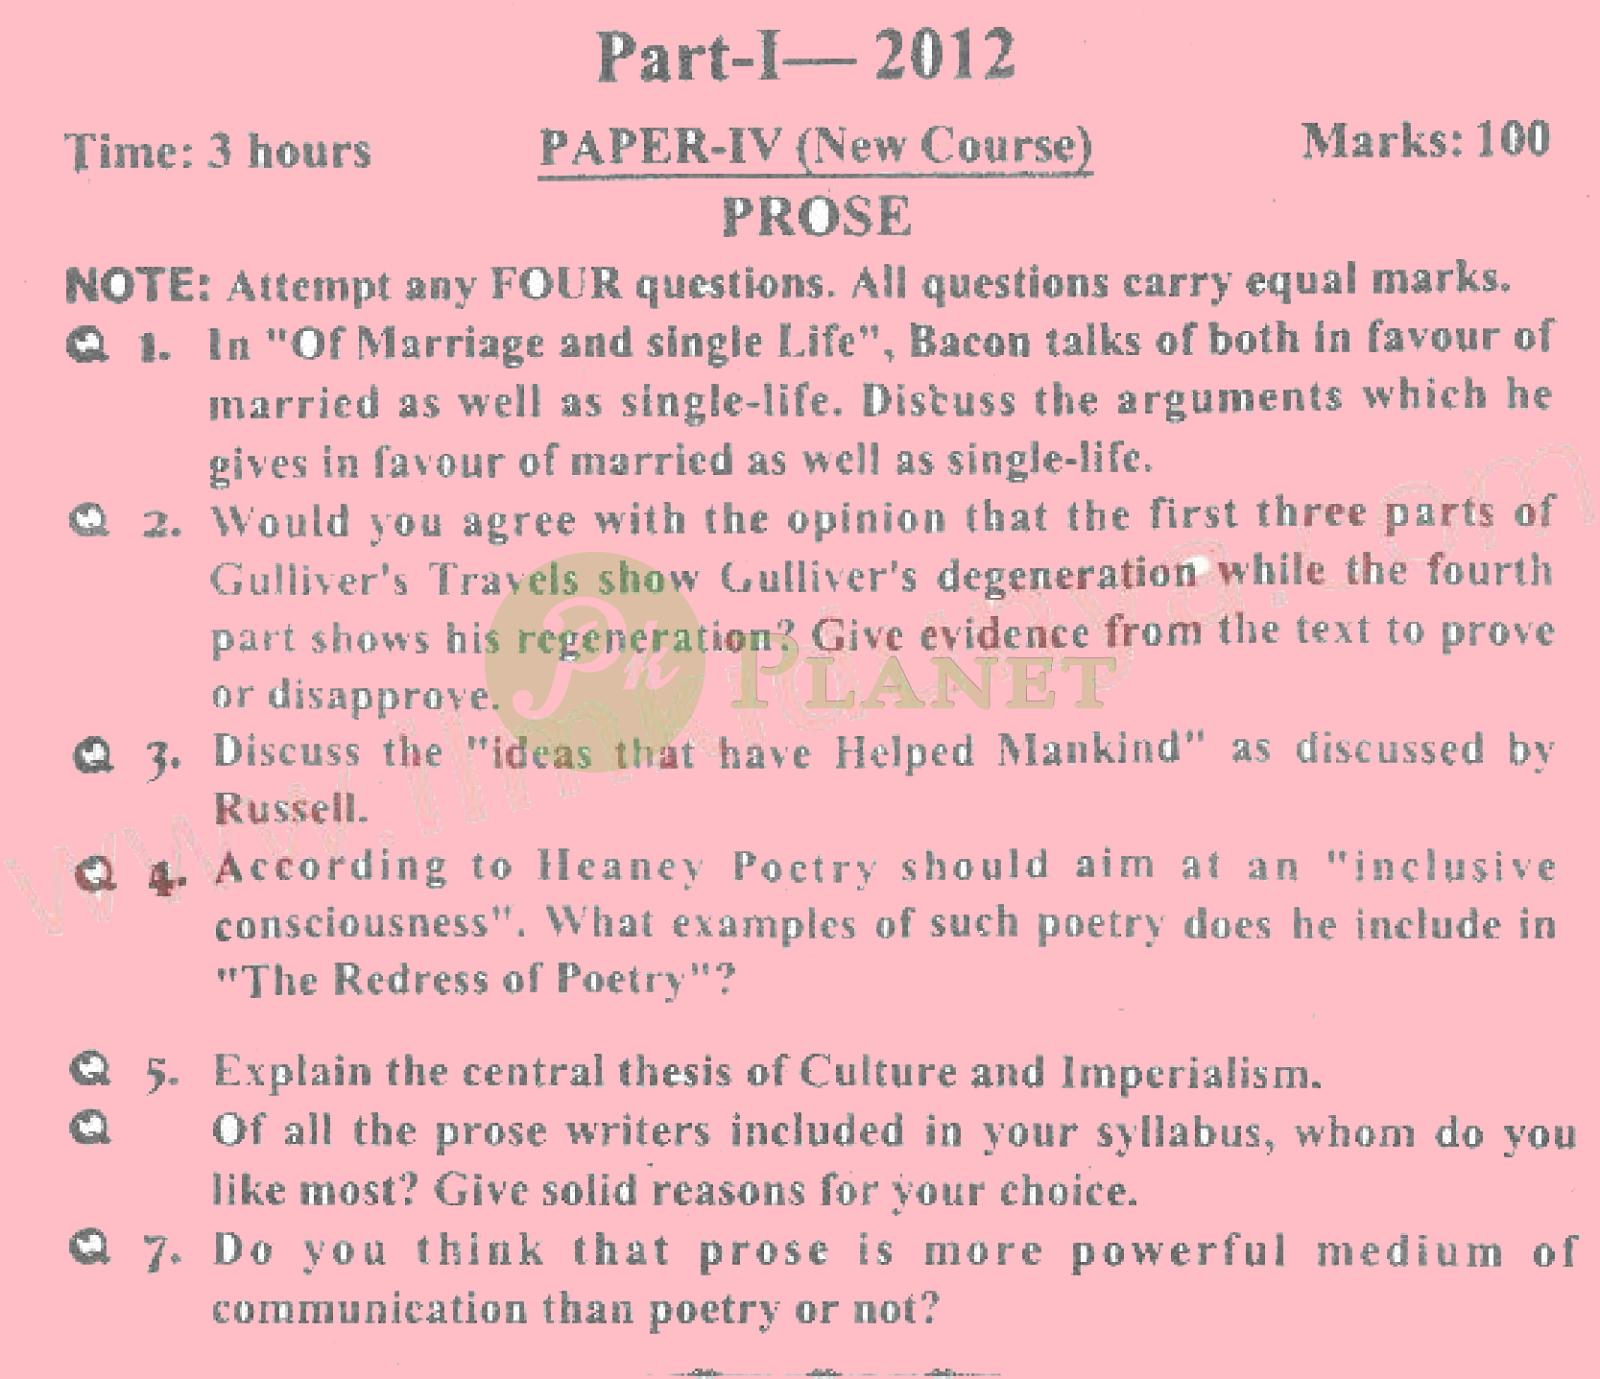 ma english part 1 past papers punjab university 2012 prose